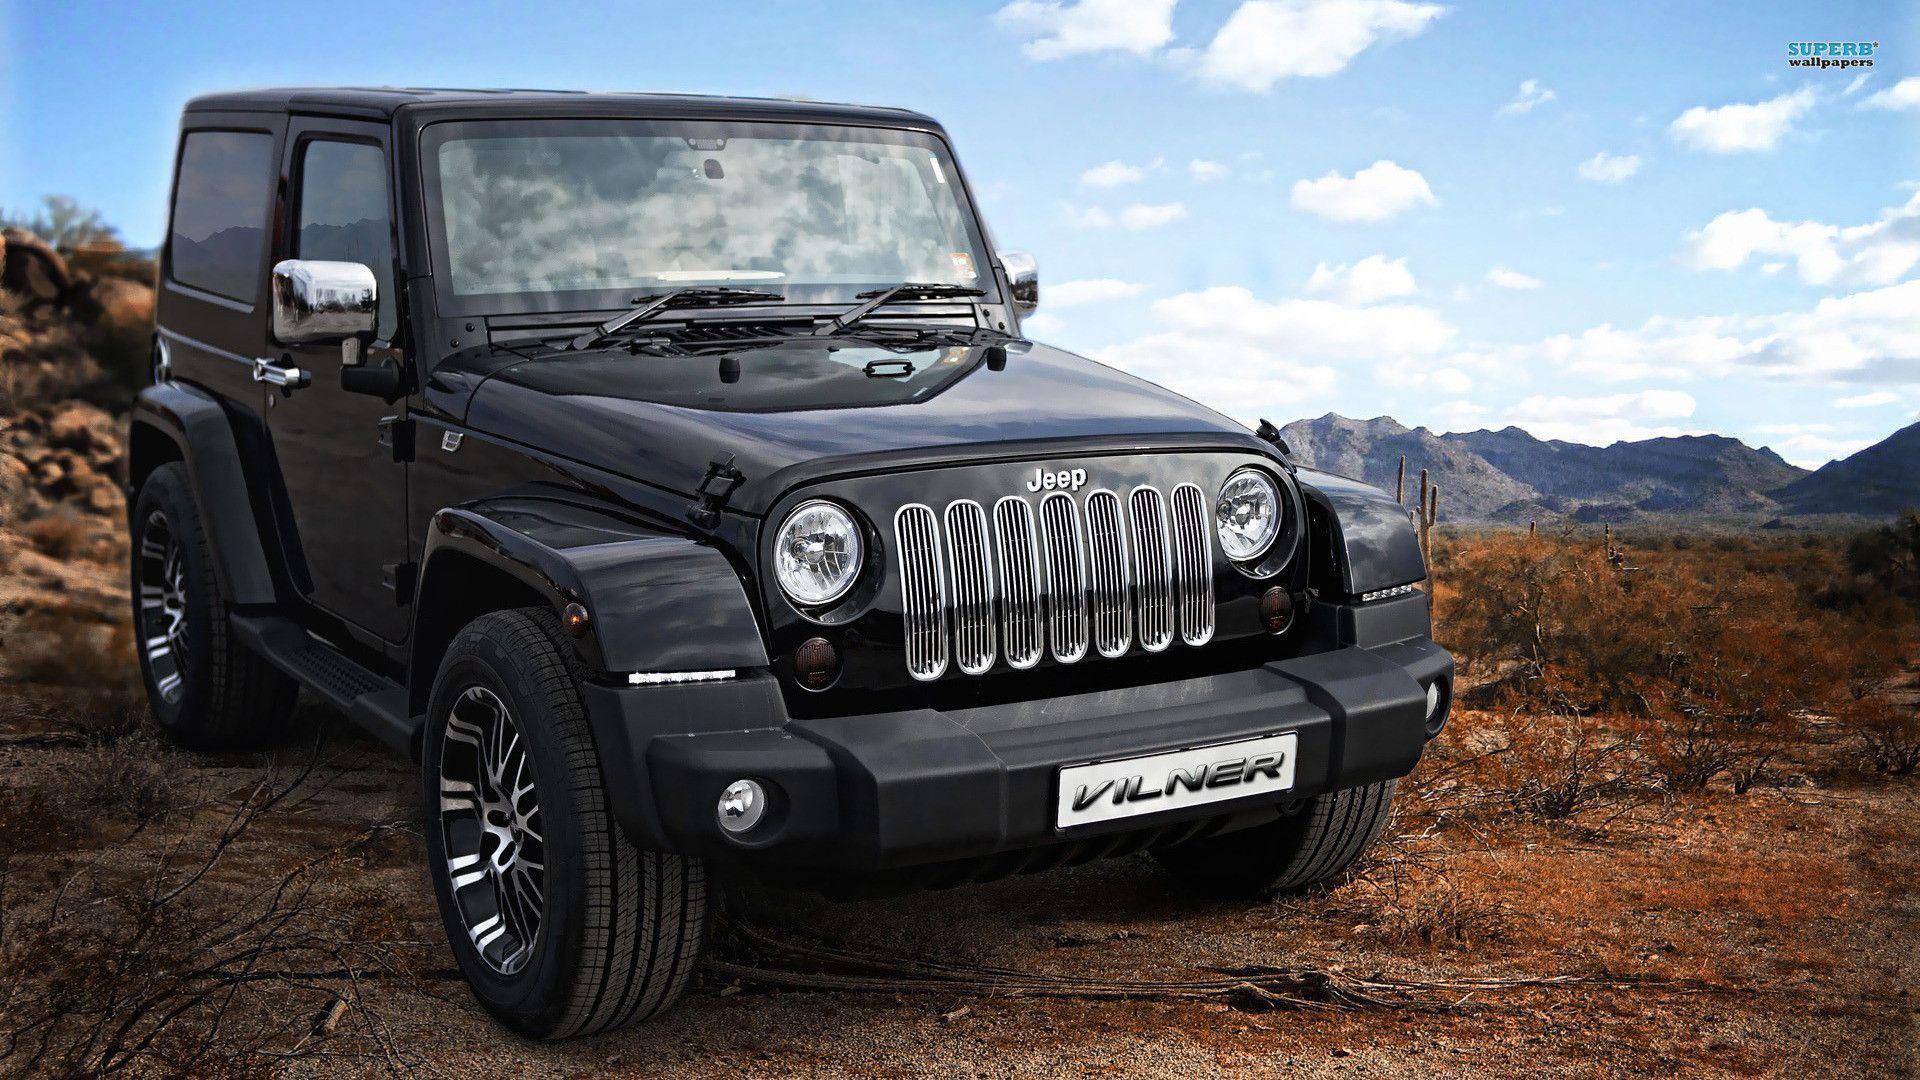 Jeep Wrangler Wallpaper Car Wallpapers Jeep Wrangler Custom Jeep Wrangler Jeep Wrangler Sahara